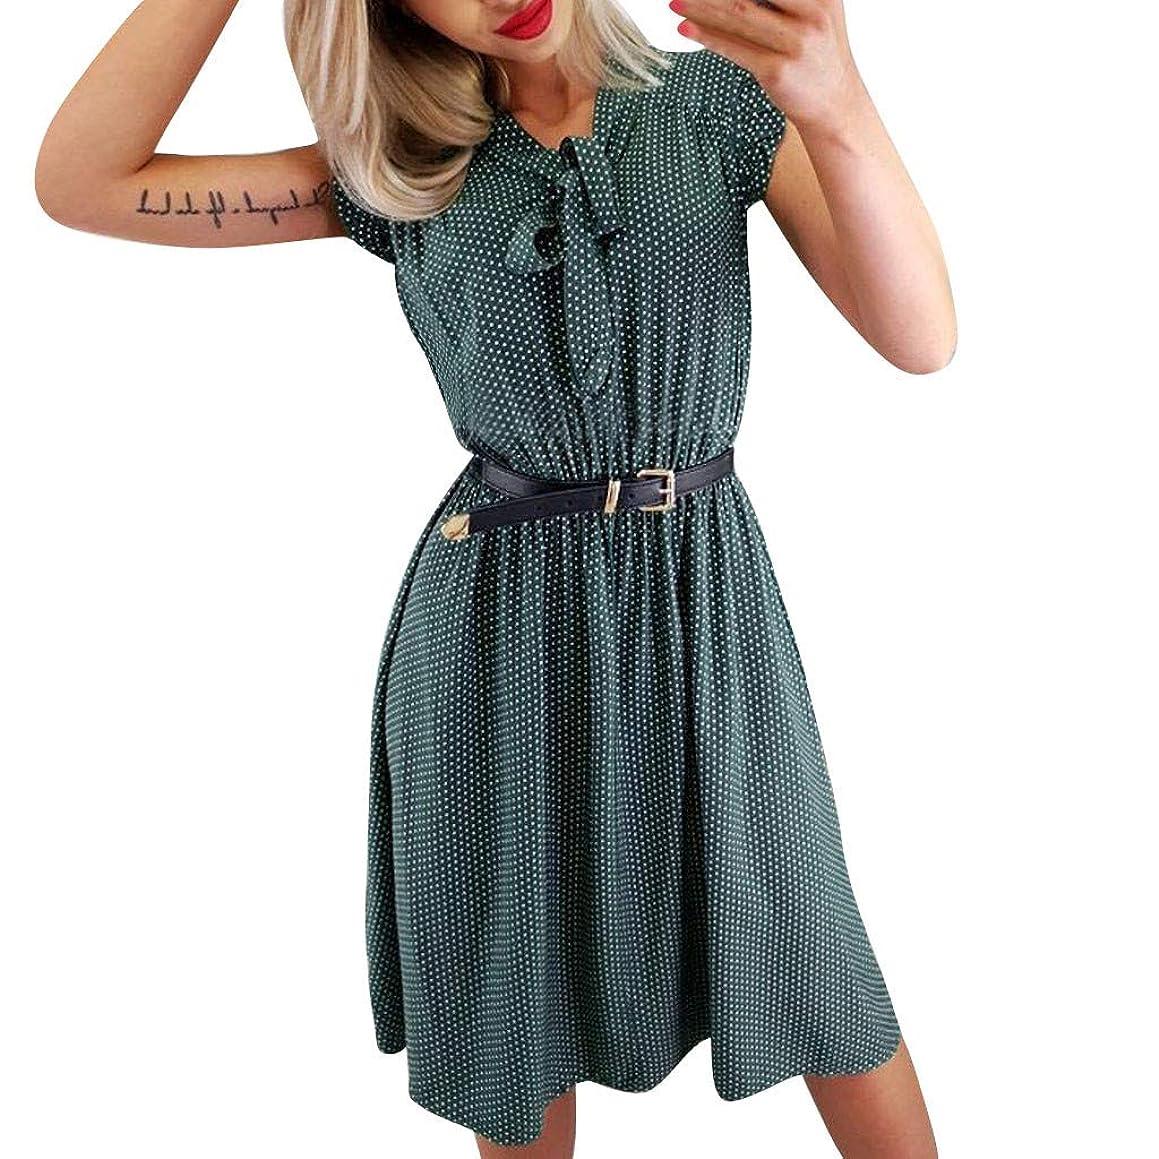 POPNINGKS Women's Vintage Dress,Casual Halter Neck Polka Dot Audrey Hepburn Dress 70s Retro Swing Midi Dresses